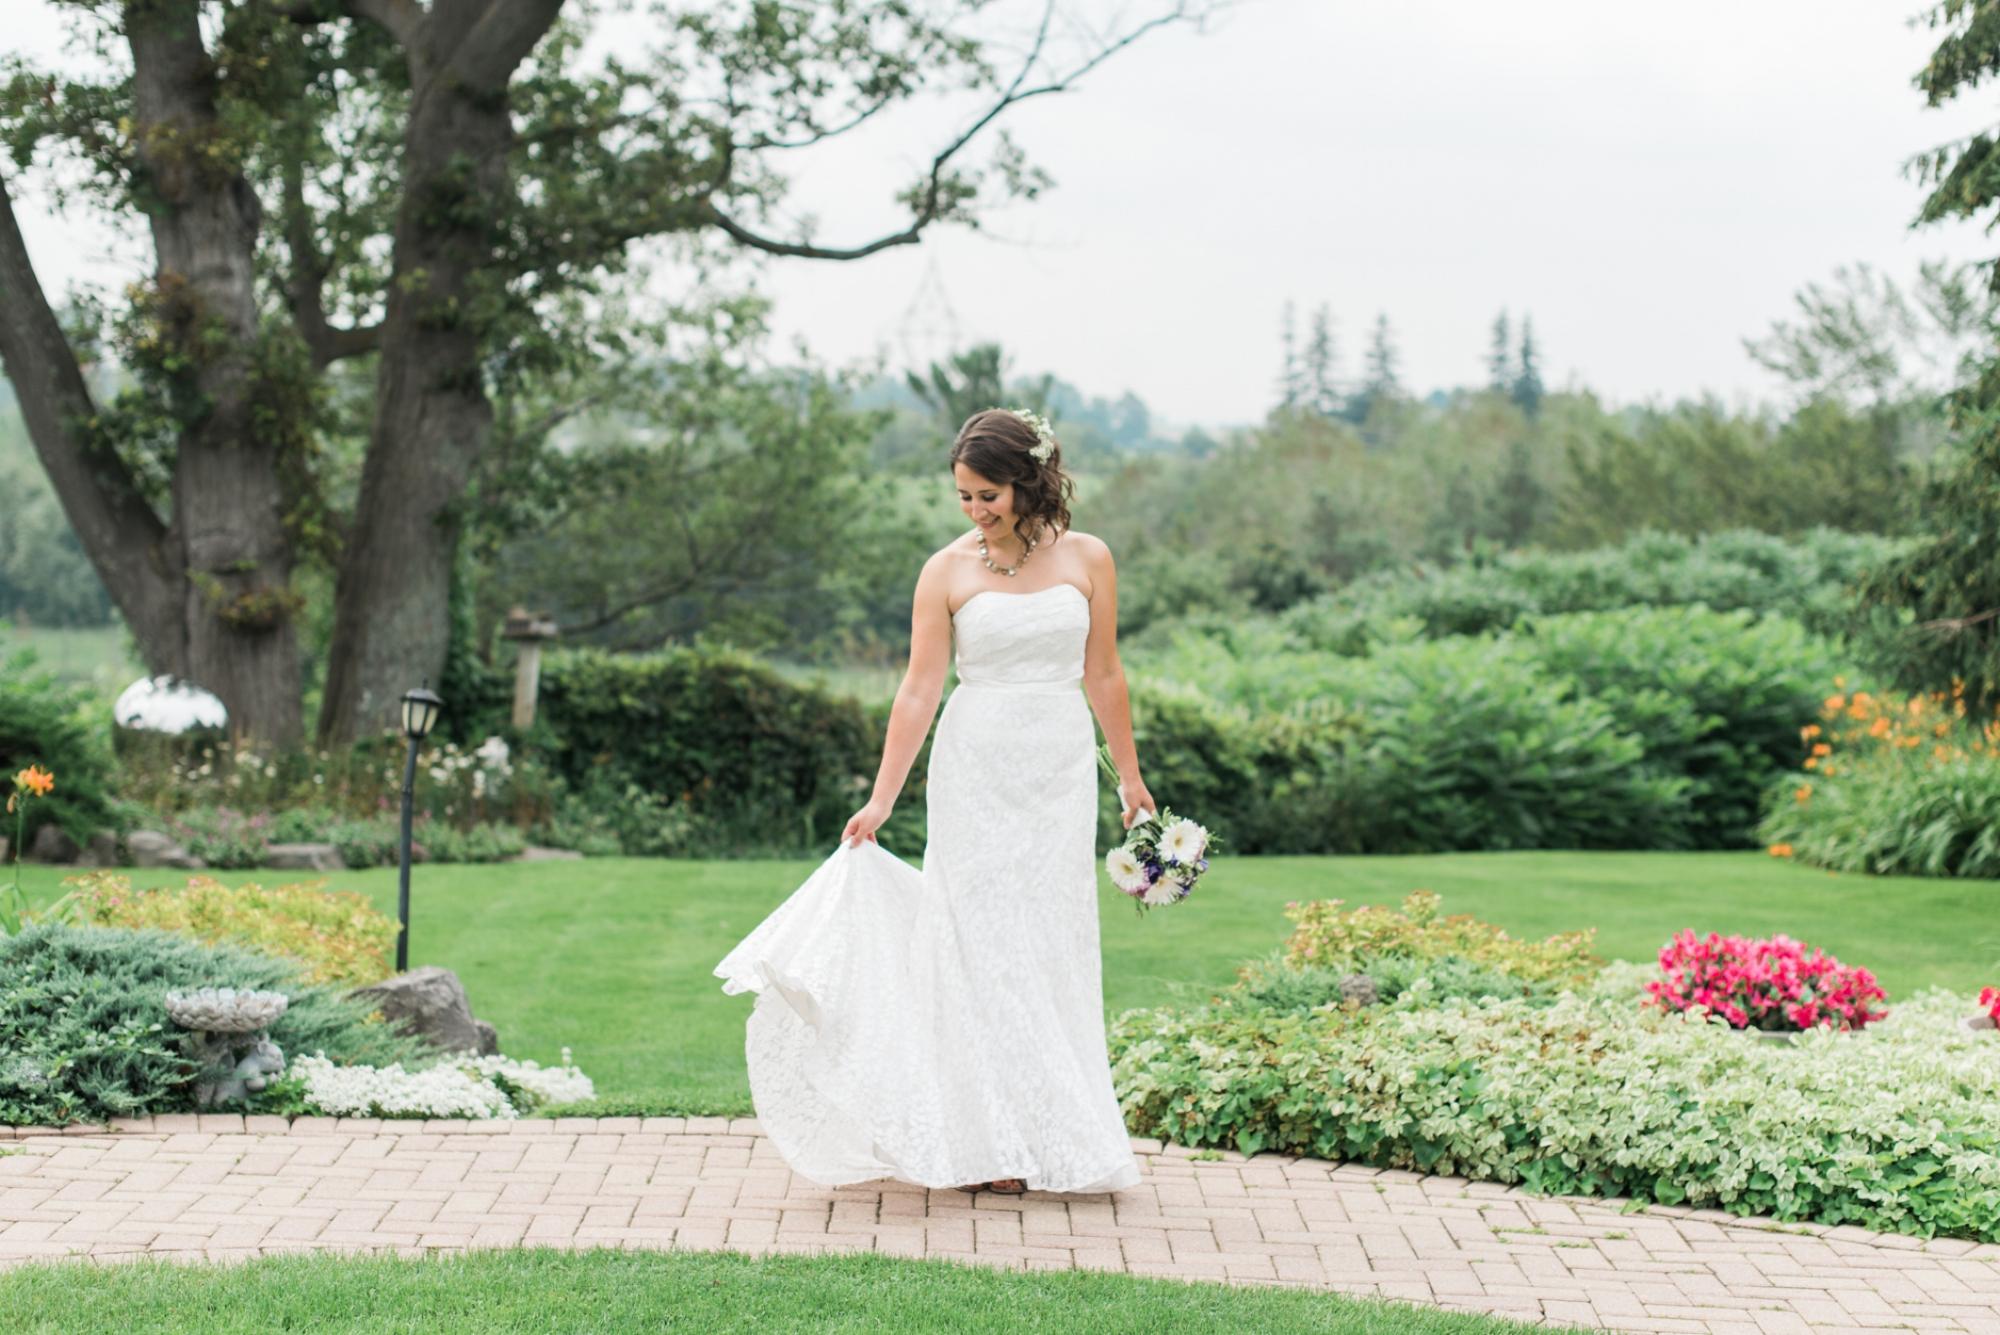 oakview-terrace-wedding-7.jpg